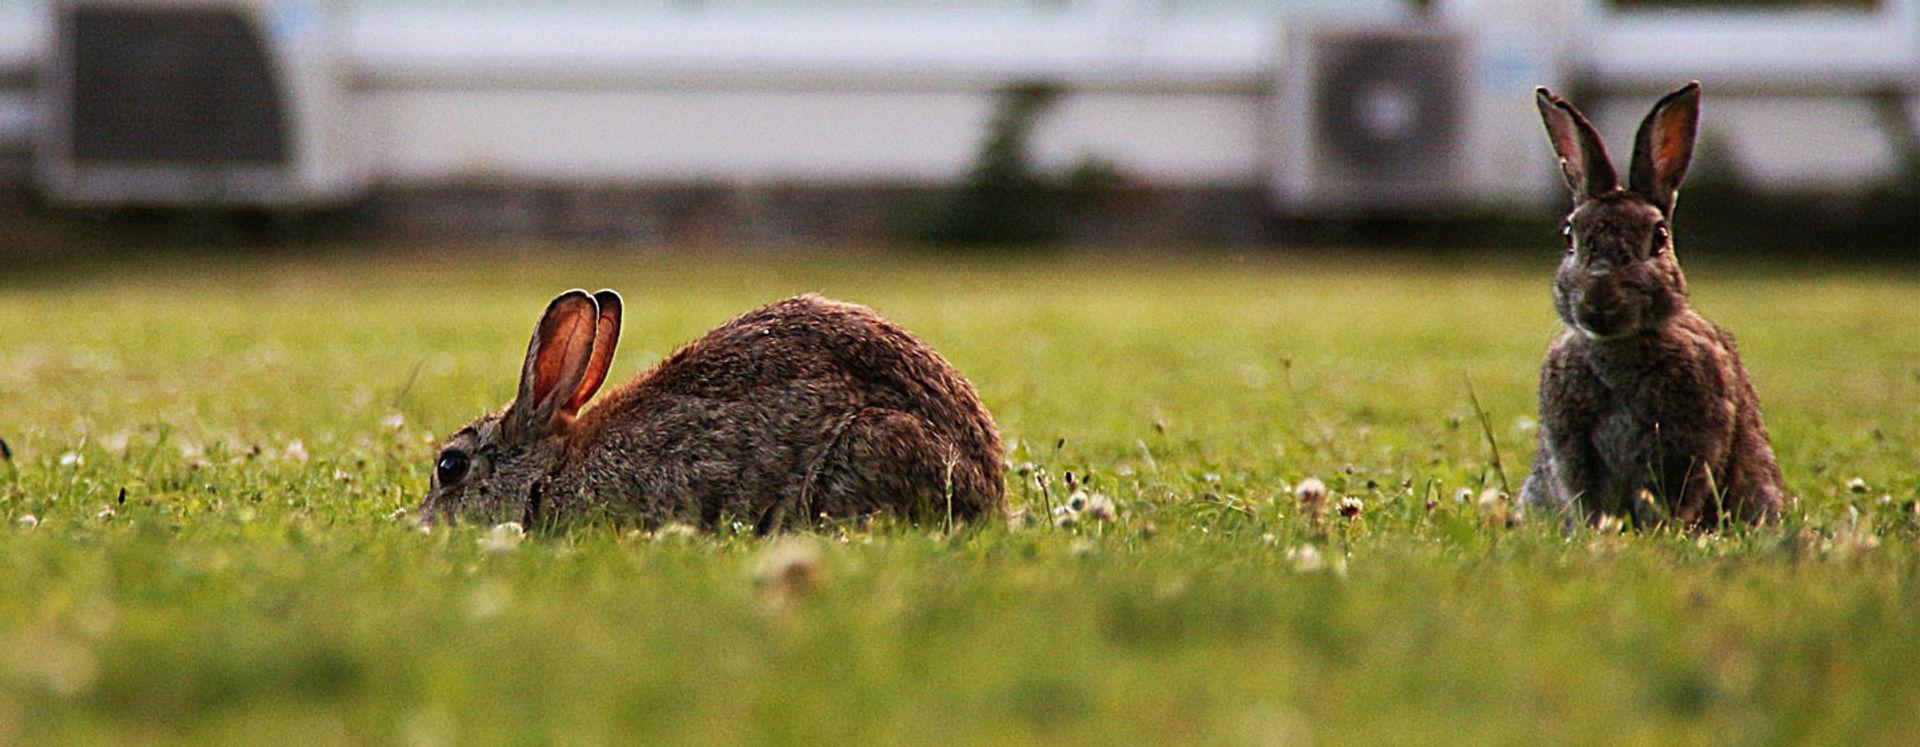 Bezorgen konijnen u overlast?